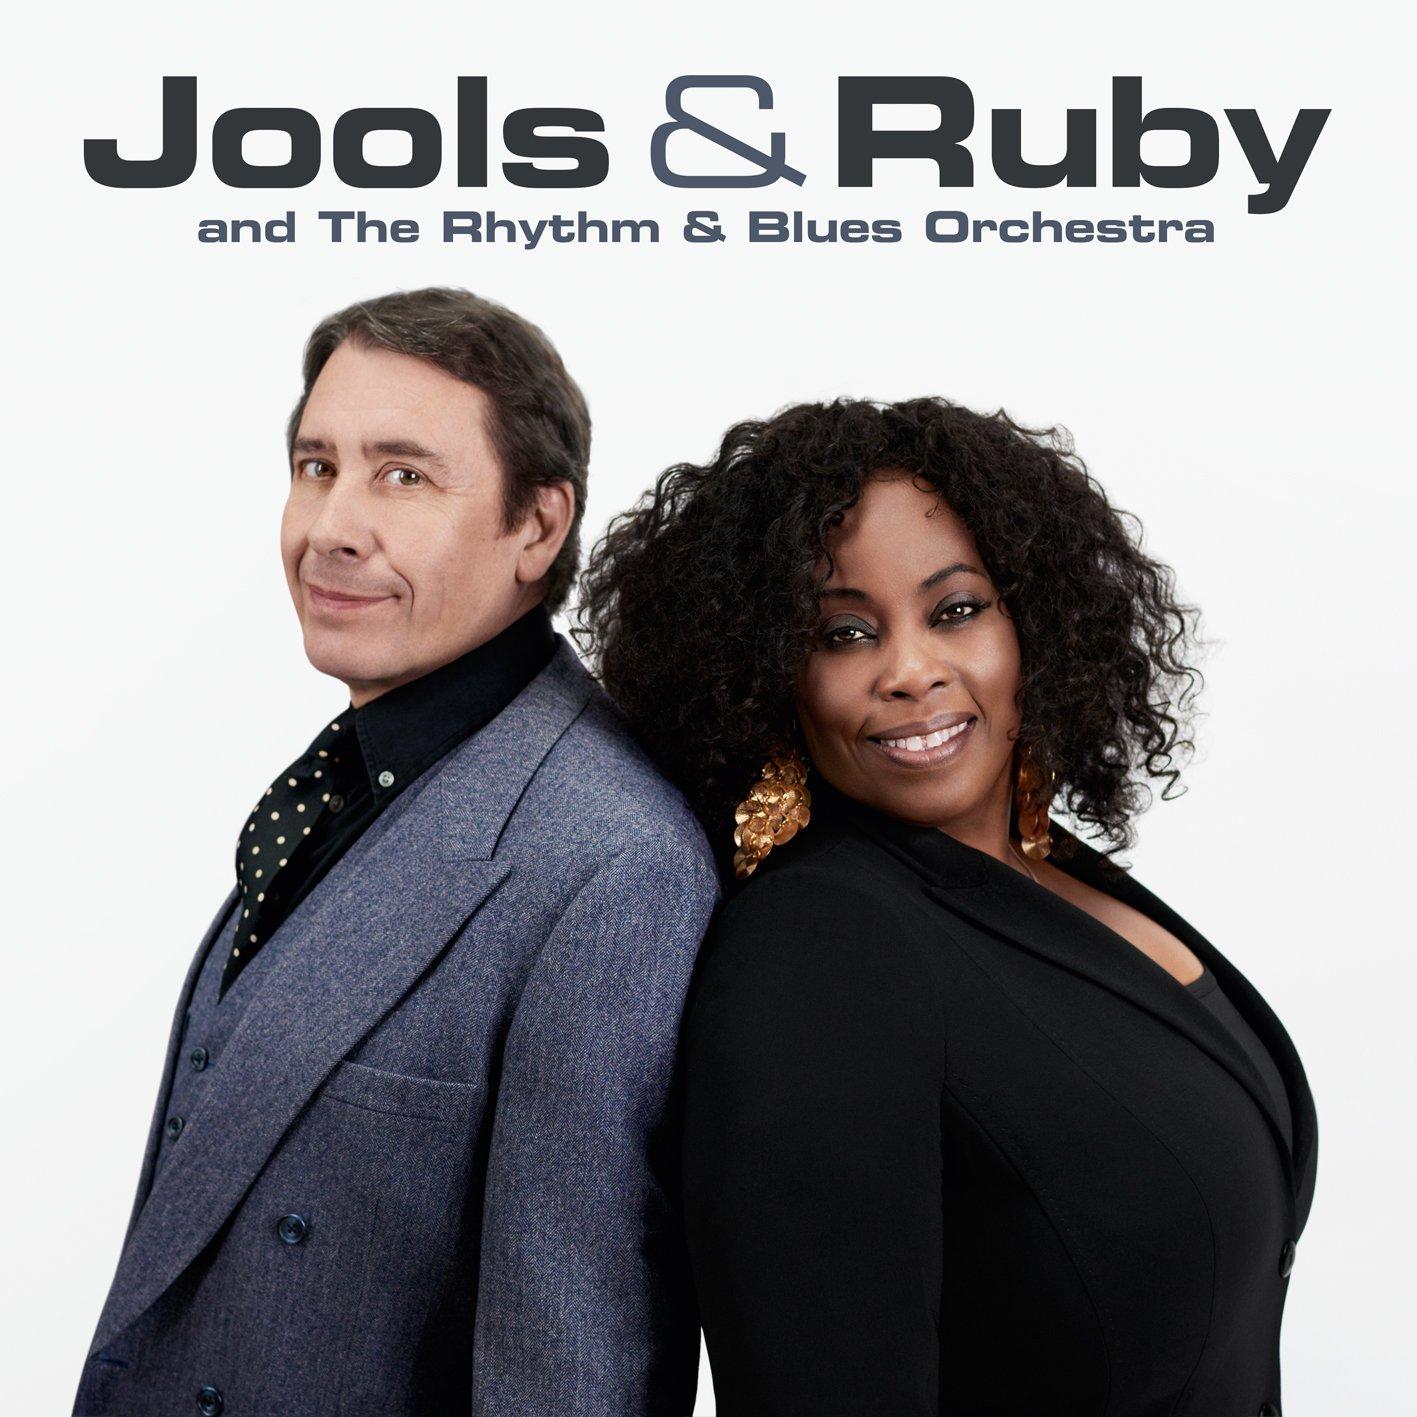 JOOLS HOLLAND / ジュールス・ホランド / JOOLS & RUBY